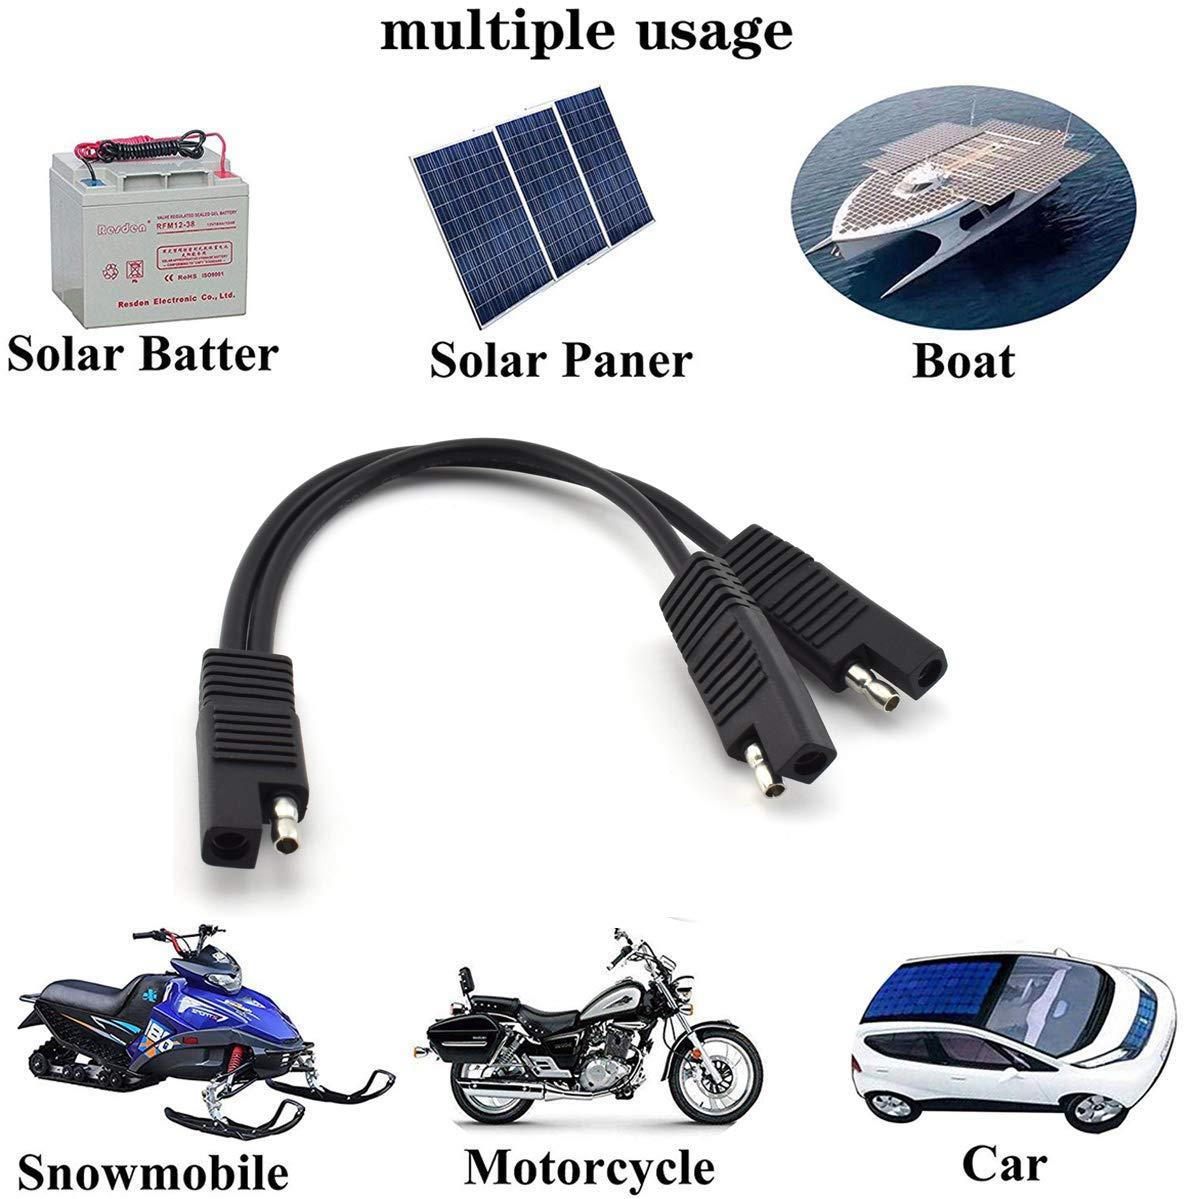 Powerbuilt 643206 3//4-Inch Drive 1-1//4-Inch 12 Point Socket